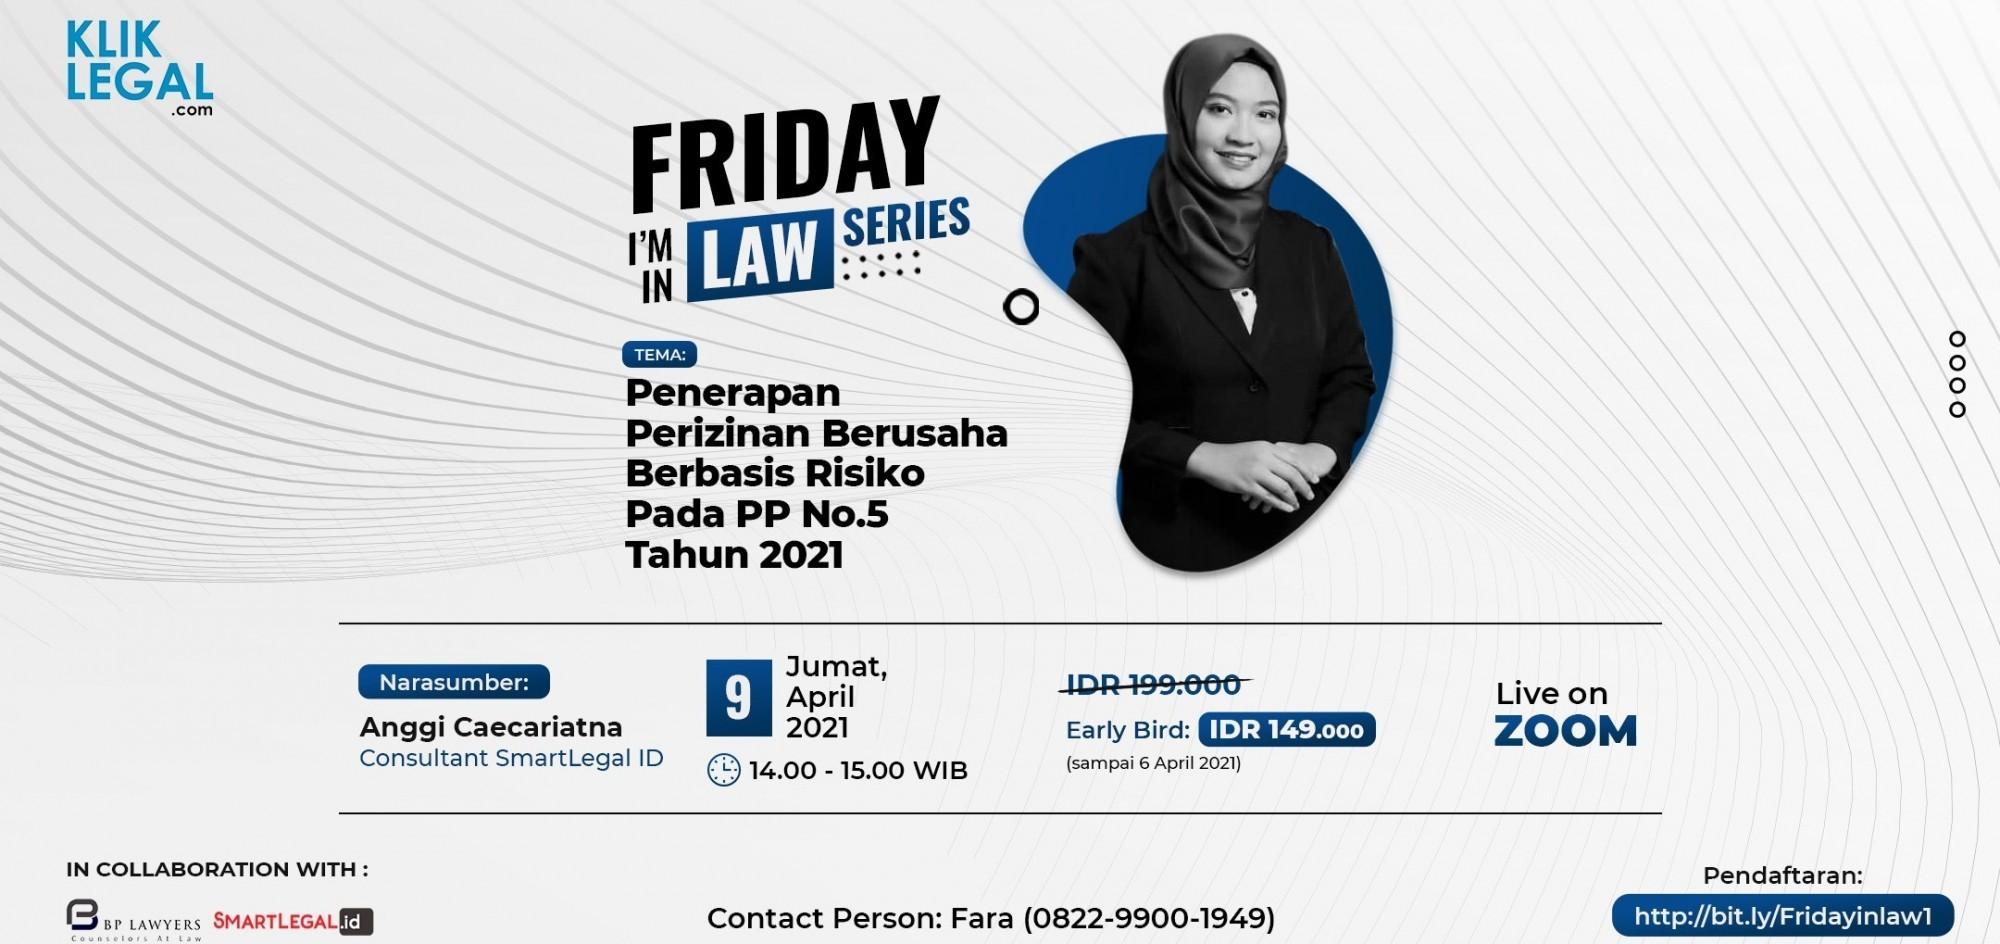 Friday I'm In Law: Penerapan Perizinan Berusaha Berbasis Risiko Pada PP No.5 Tahun 2021